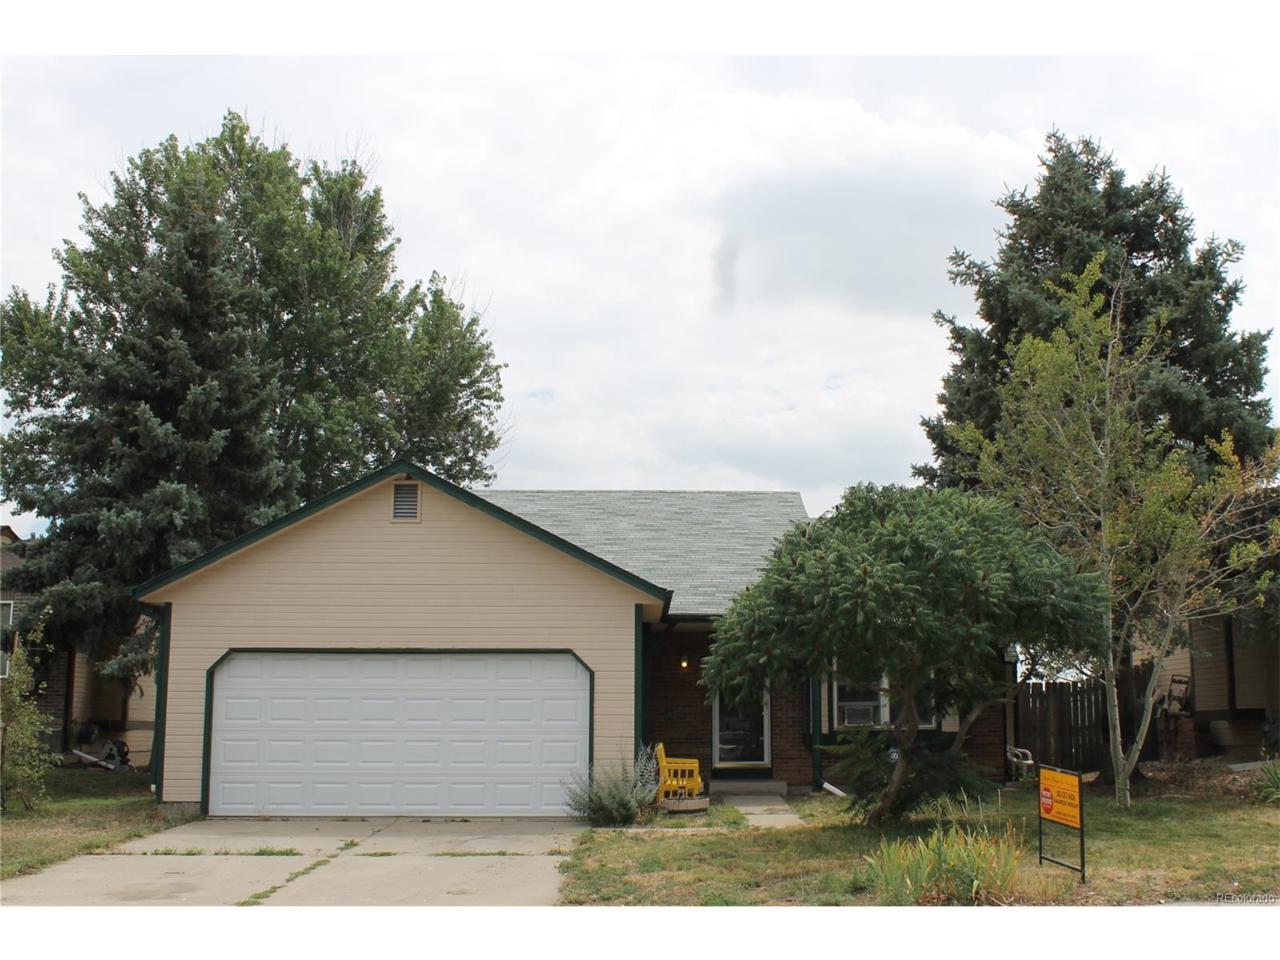 14890 E 43rd Avenue, Denver, CO 80239 (MLS #4567017) :: 8z Real Estate